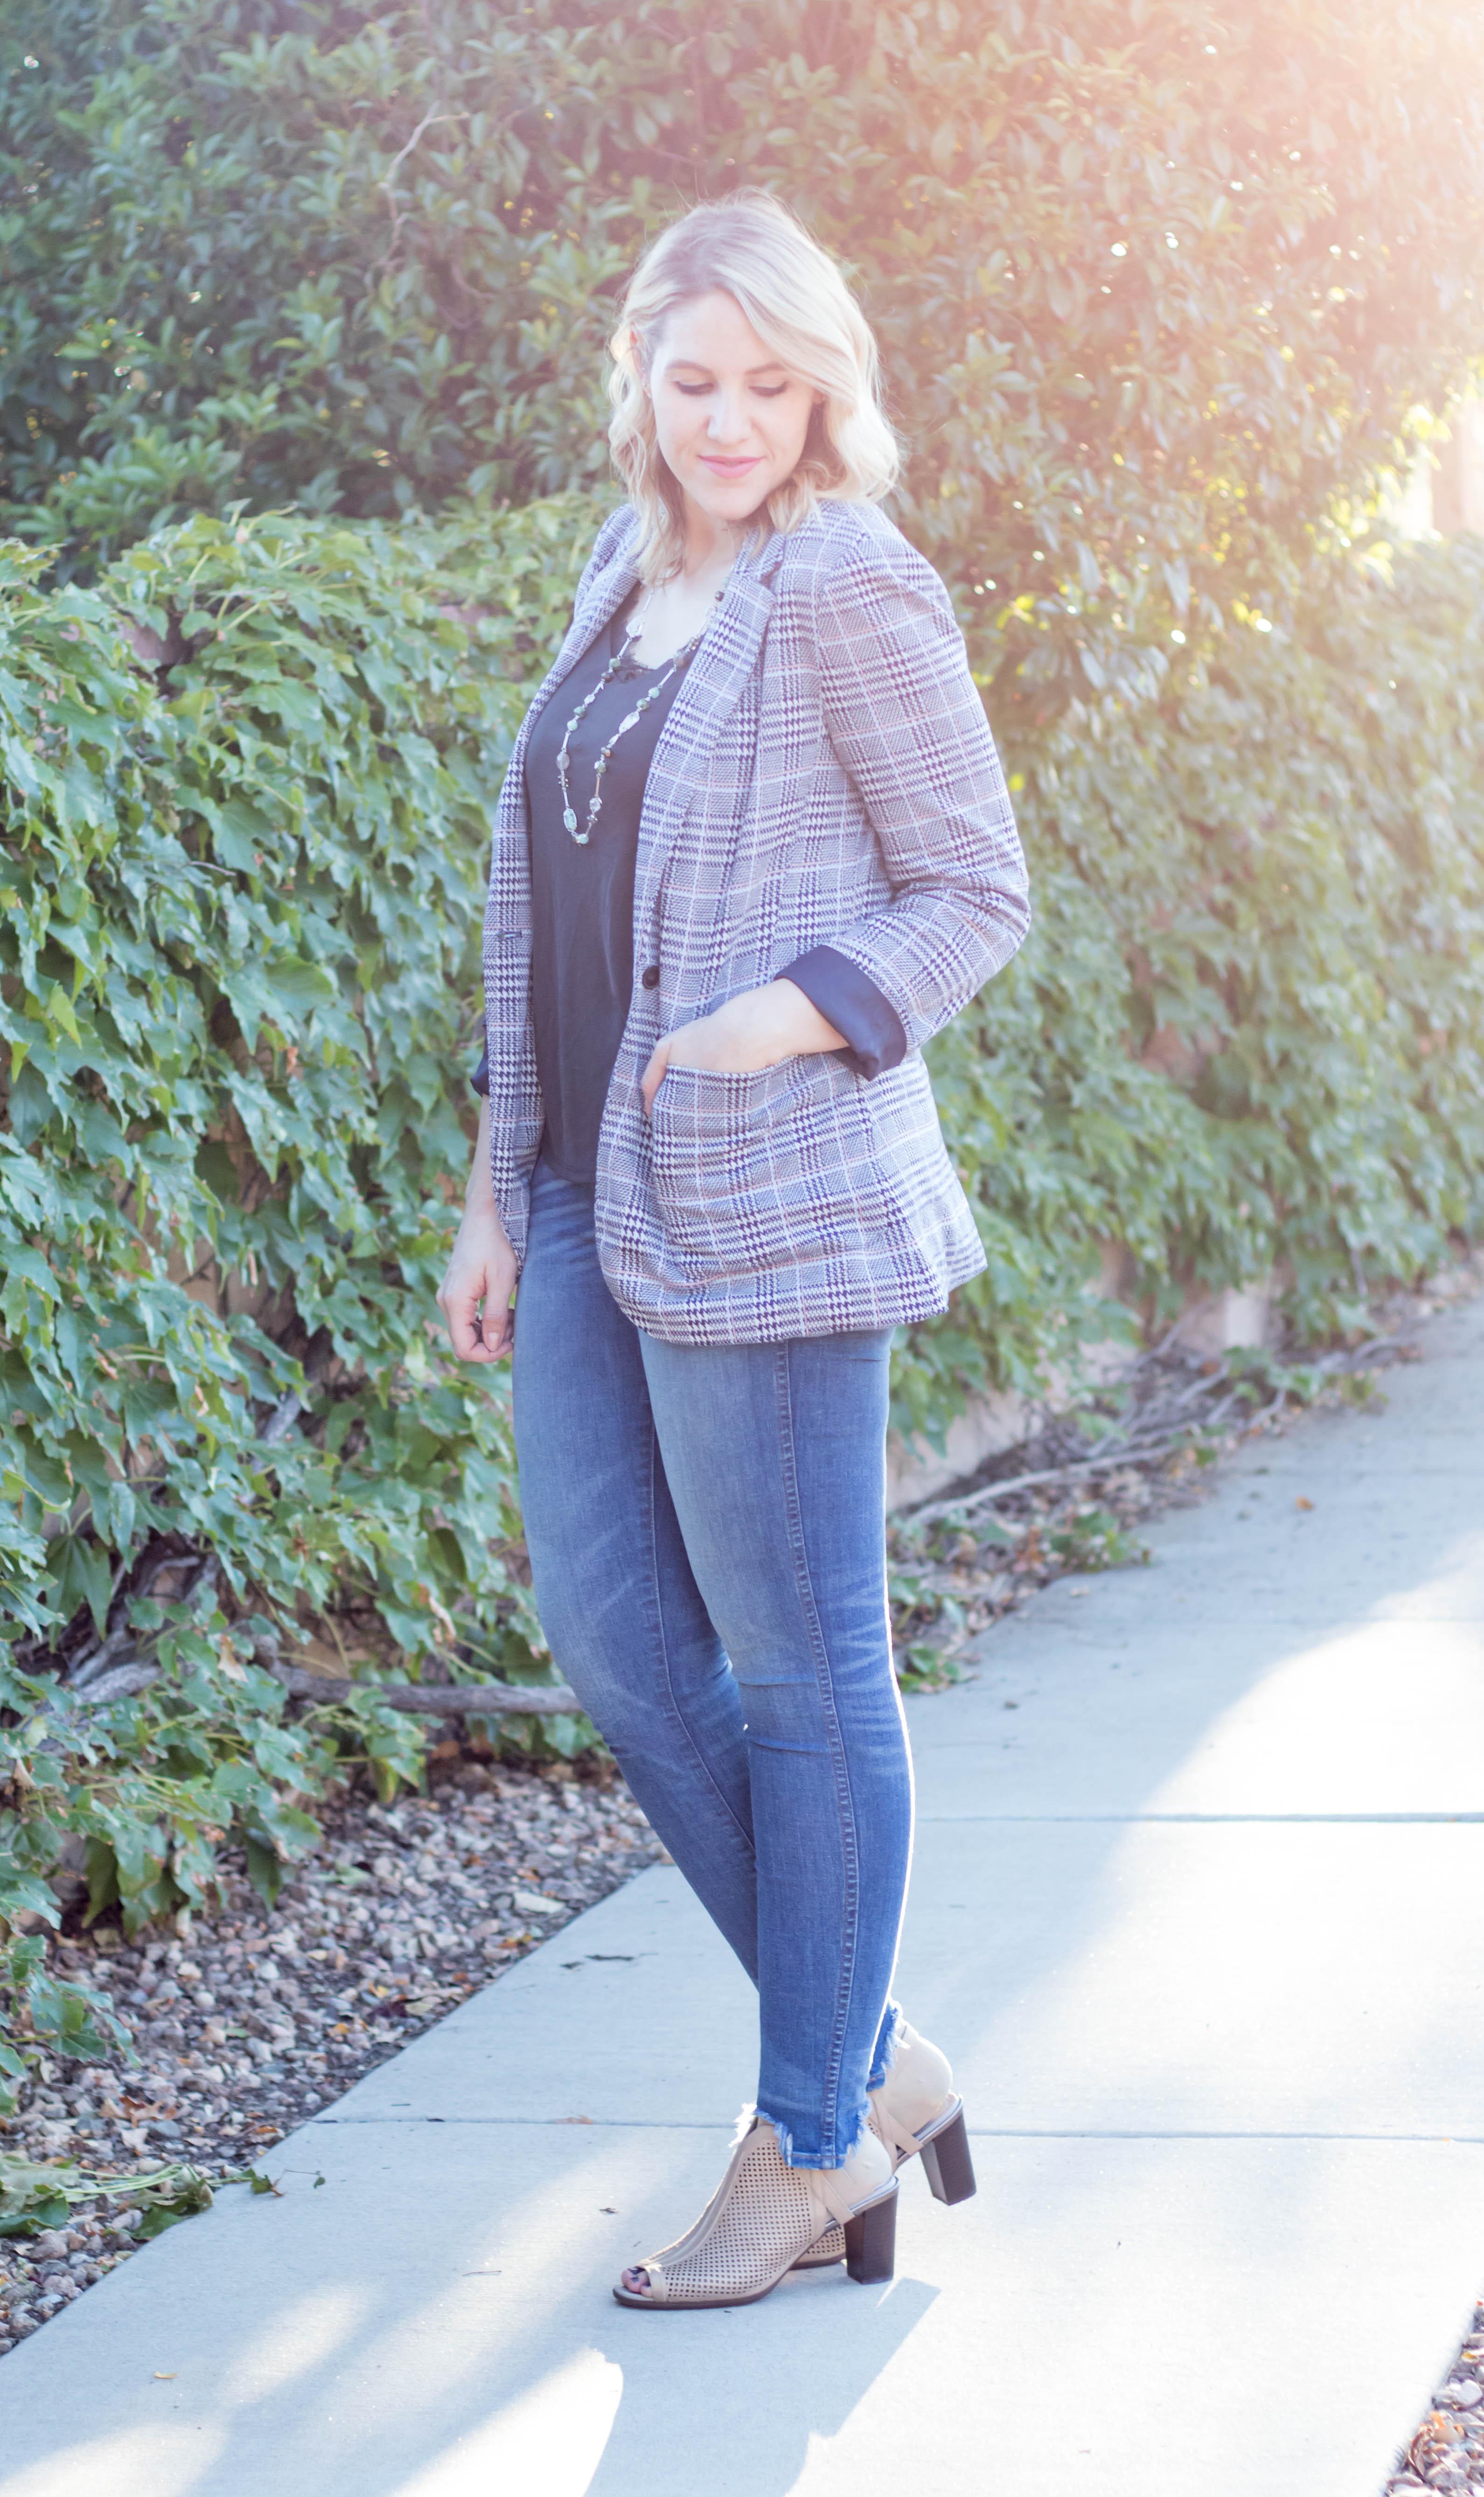 fall outfit with plaid blazer #theweeklystyleedit #fashionblogger #fallfashion #falloutfit